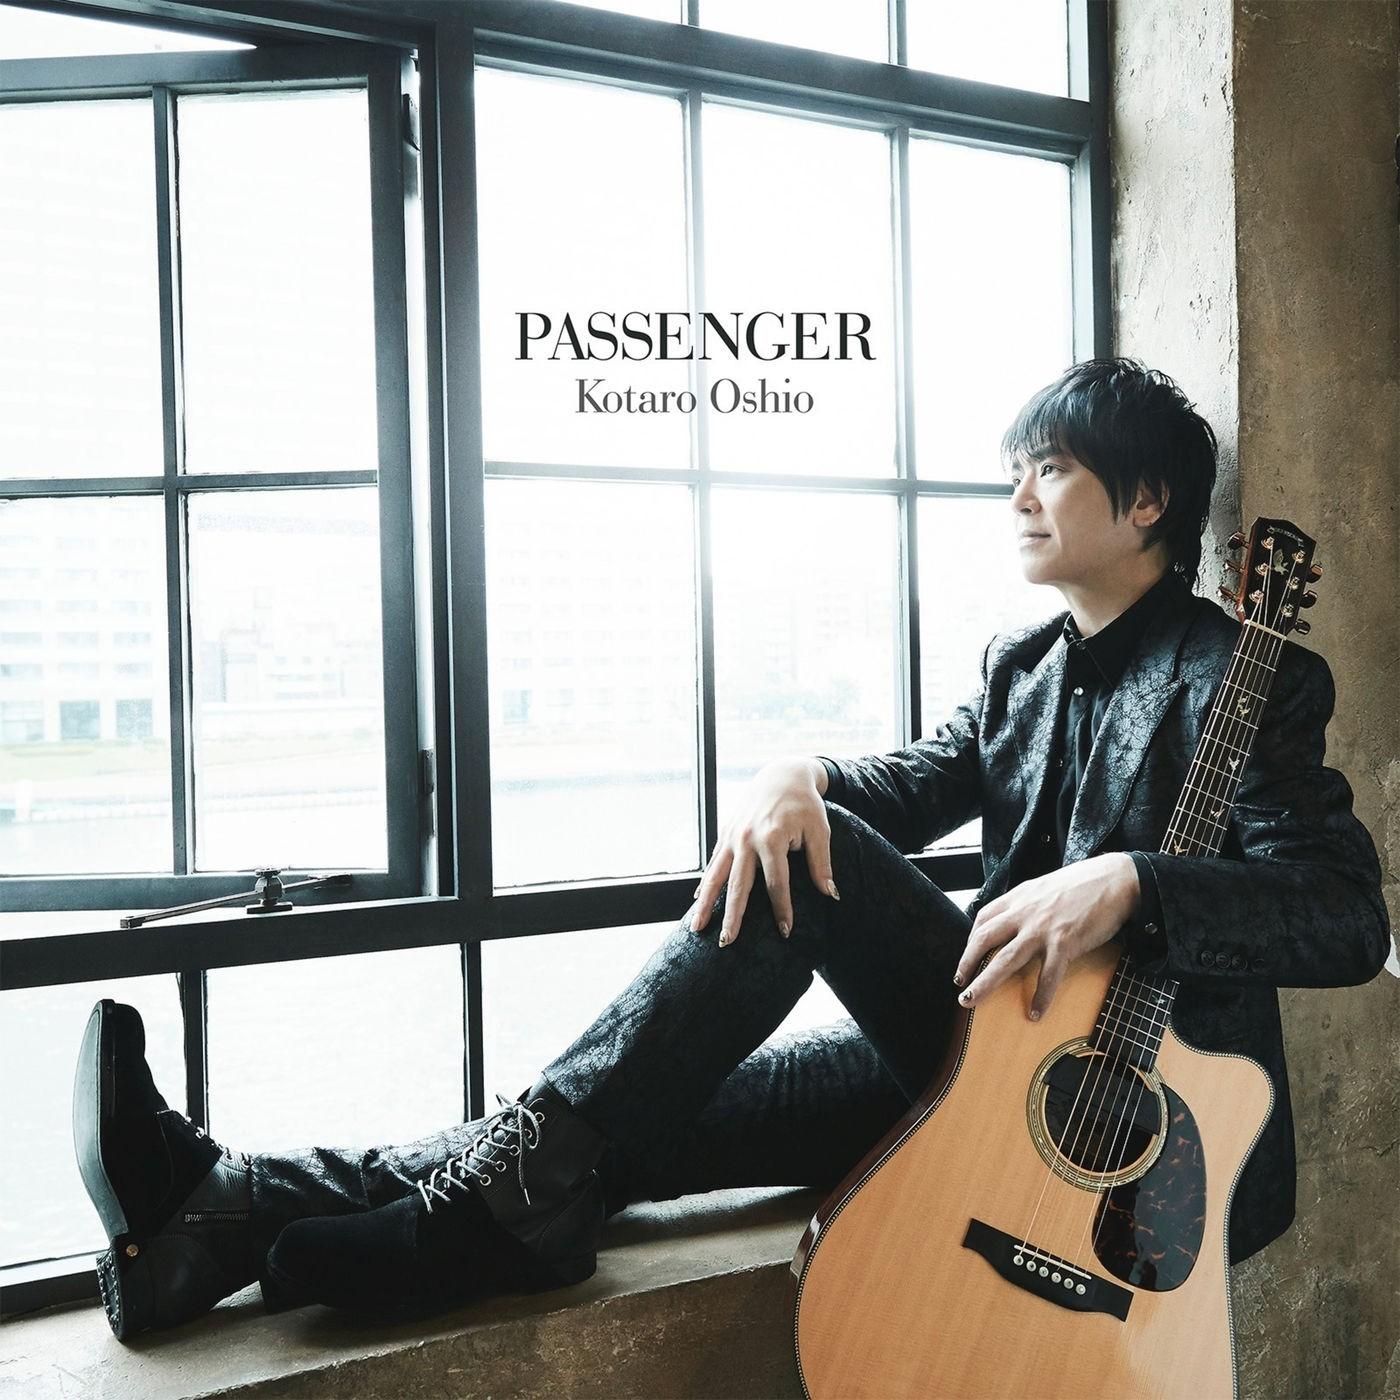 [Album] 押尾コータロー (Kotaro Oshio) – PASSENGER [FLAC / 24bit Lossless / WEB] [2020.09.30]